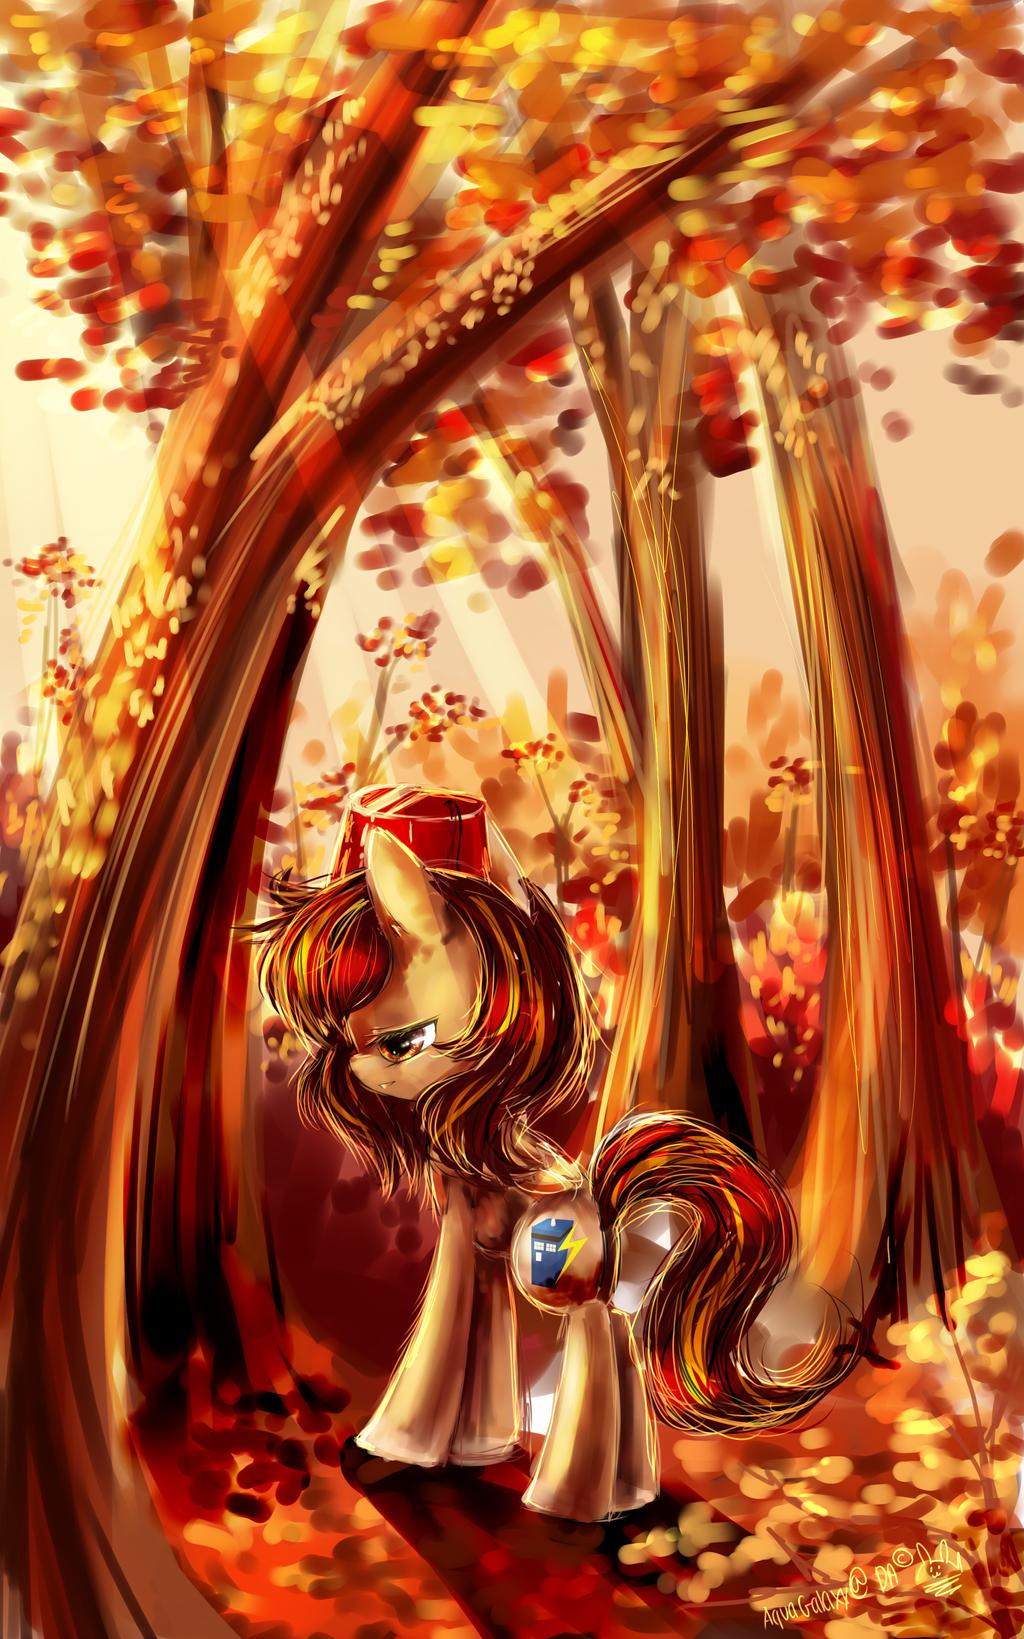 Pony Autumn bloom by AquaGalaxy